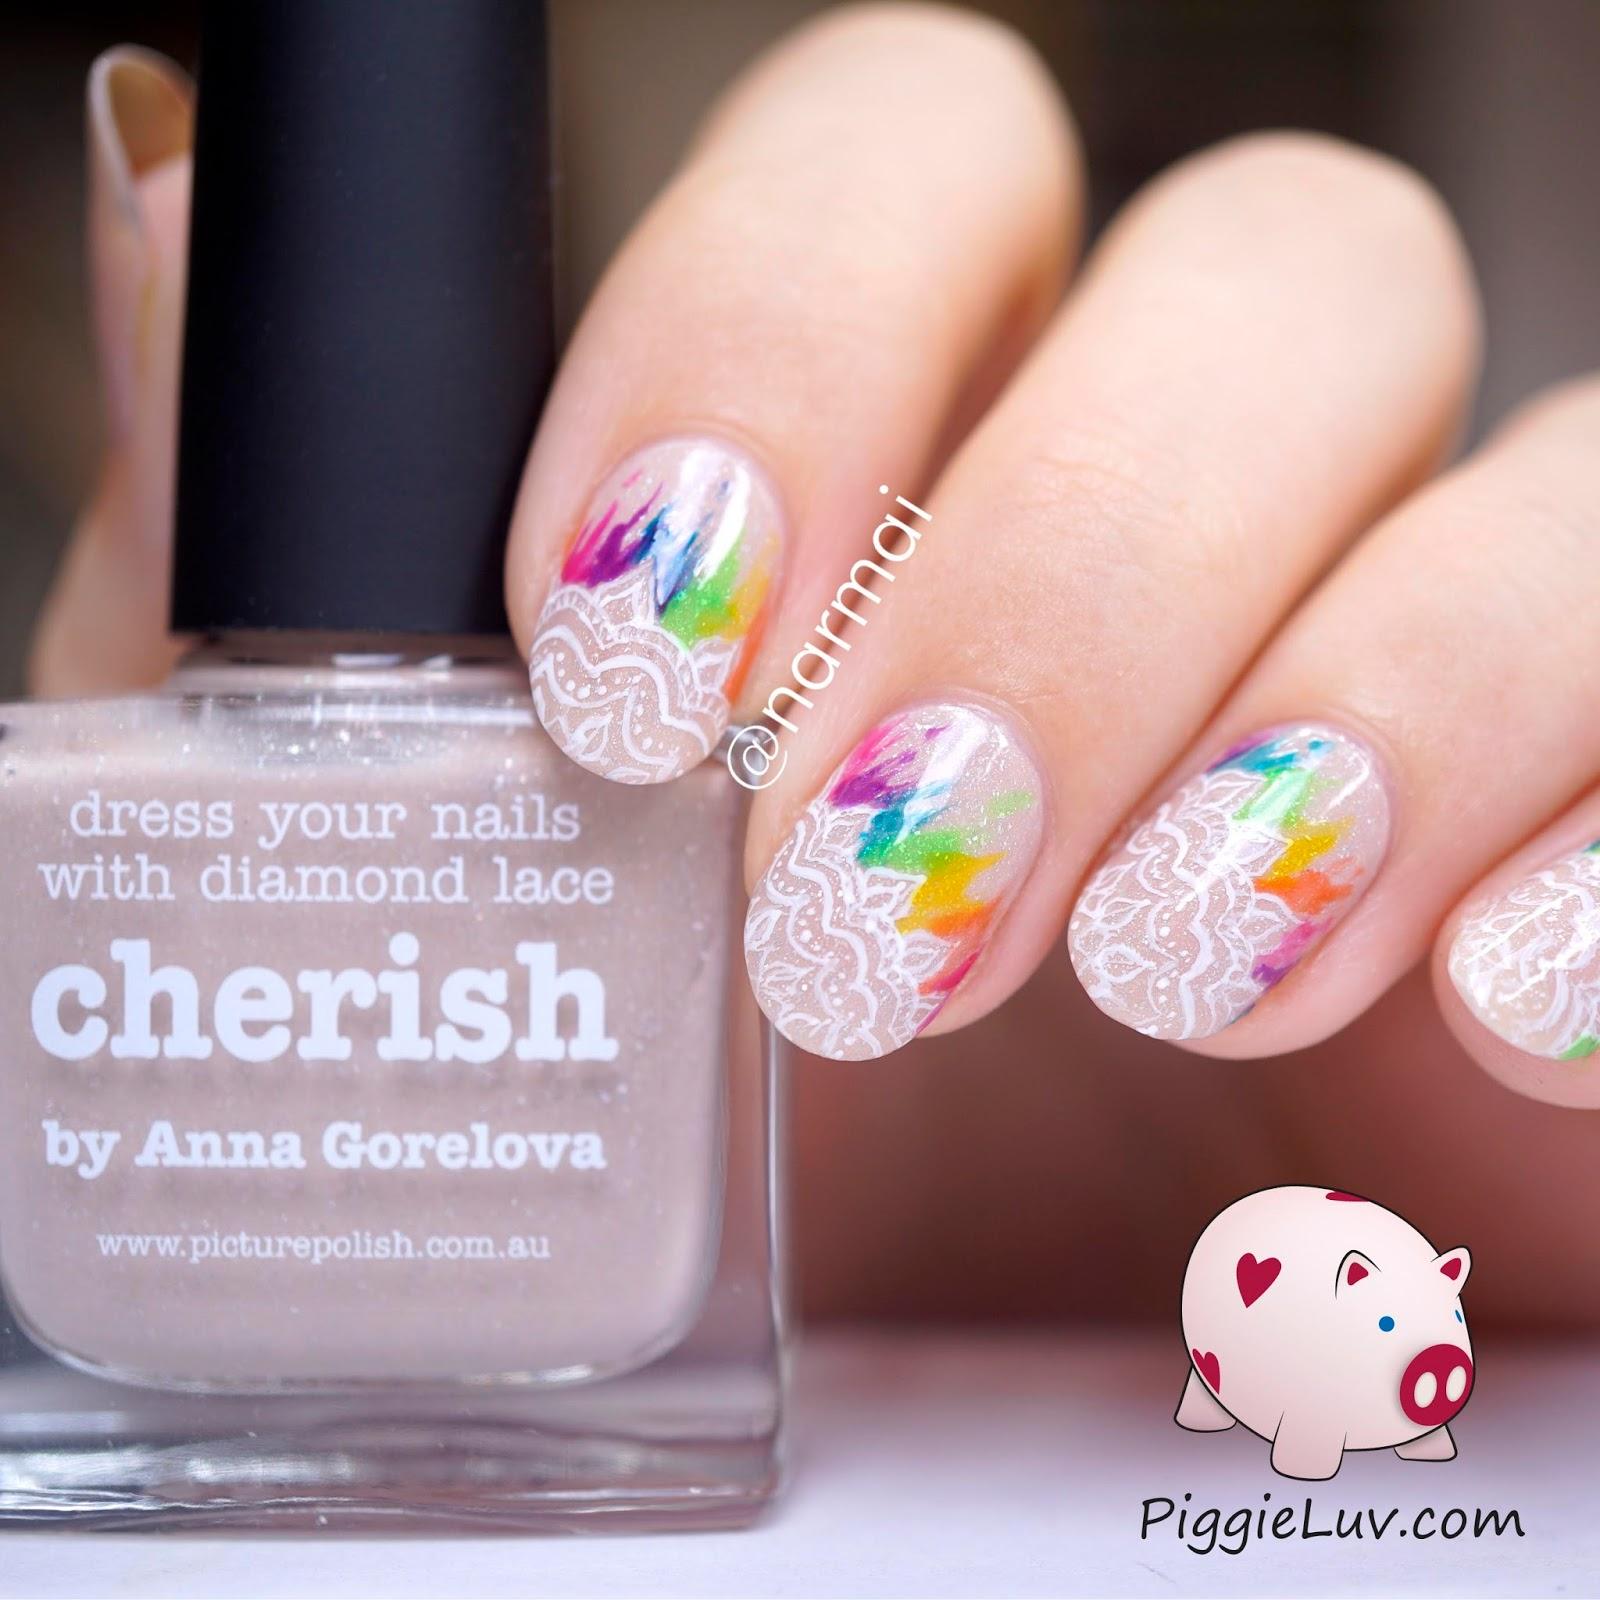 Piggieluv Rainbow Bubbles Nail Art: PiggieLuv: Rainbow Lace Bridal Style Nail Art With OPI